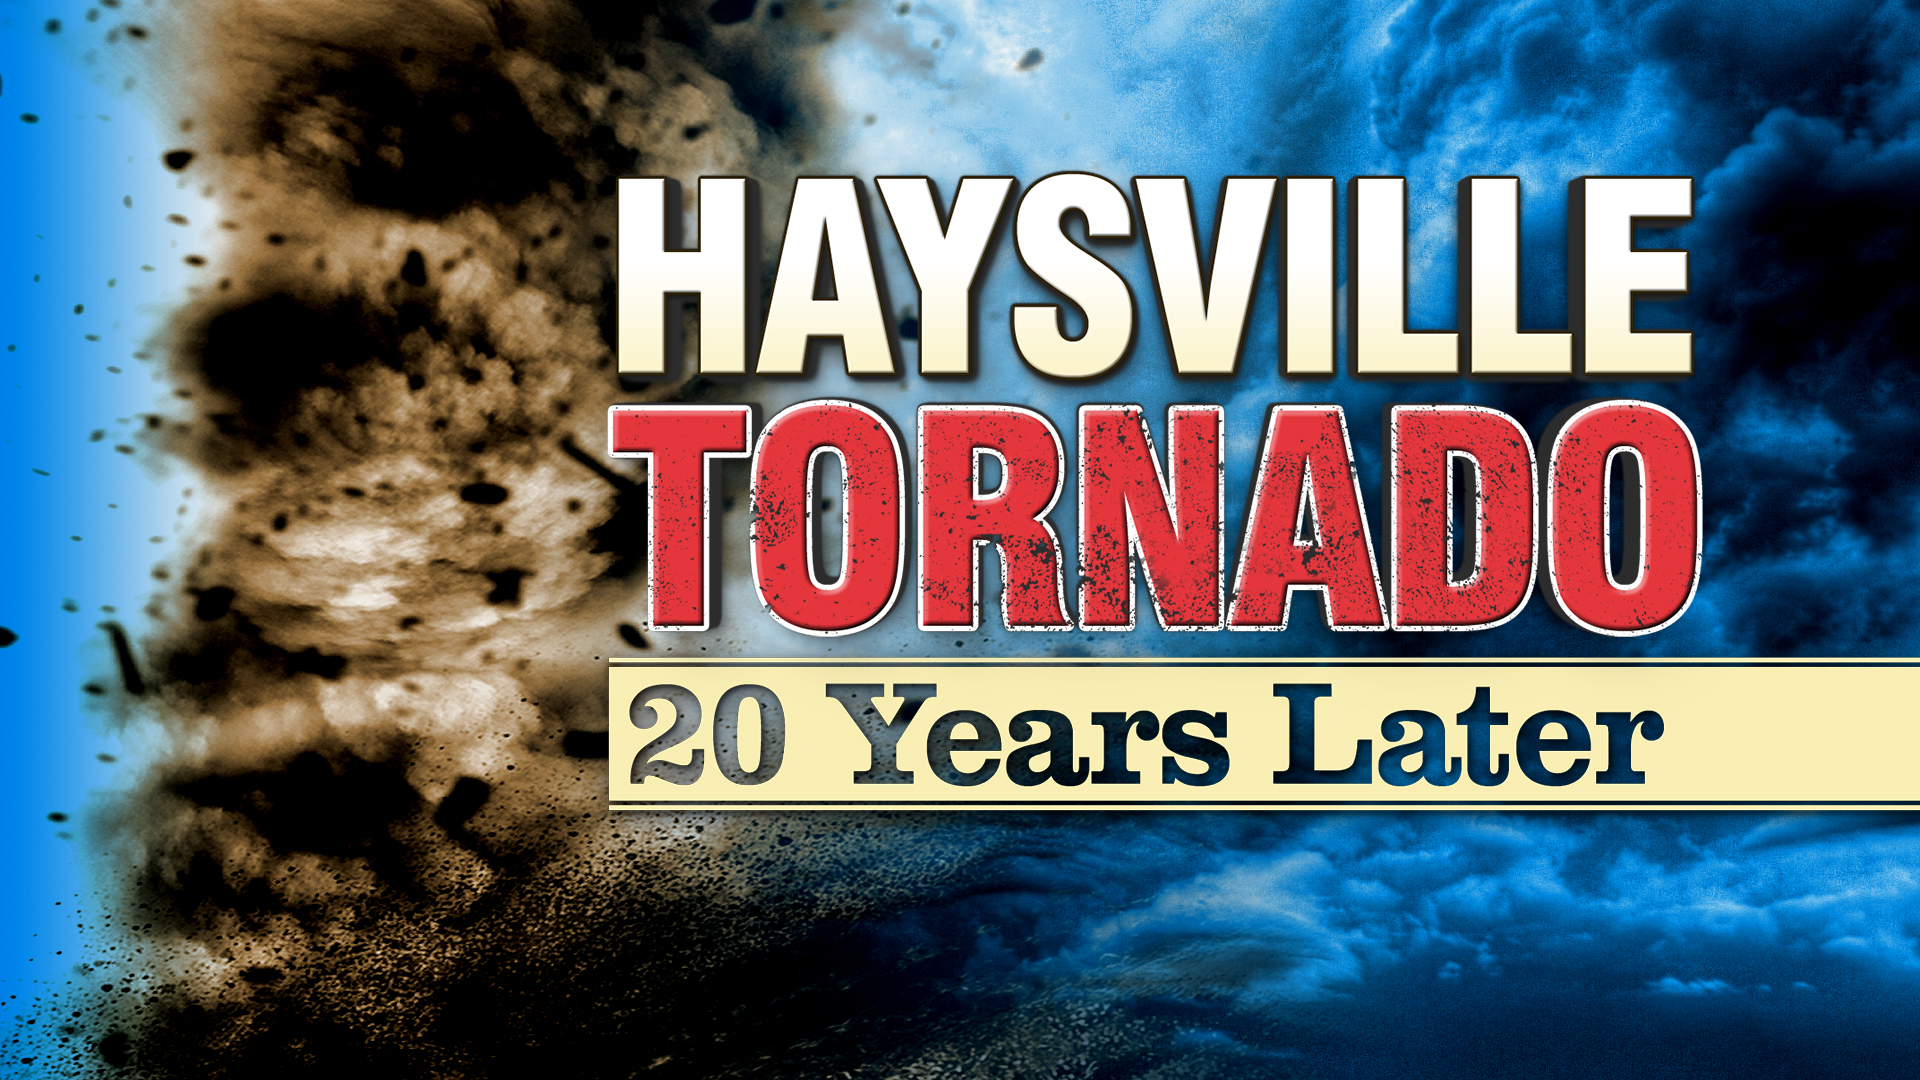 Haysville Tornado 20 Years Later_1556830805579.jpg.jpg